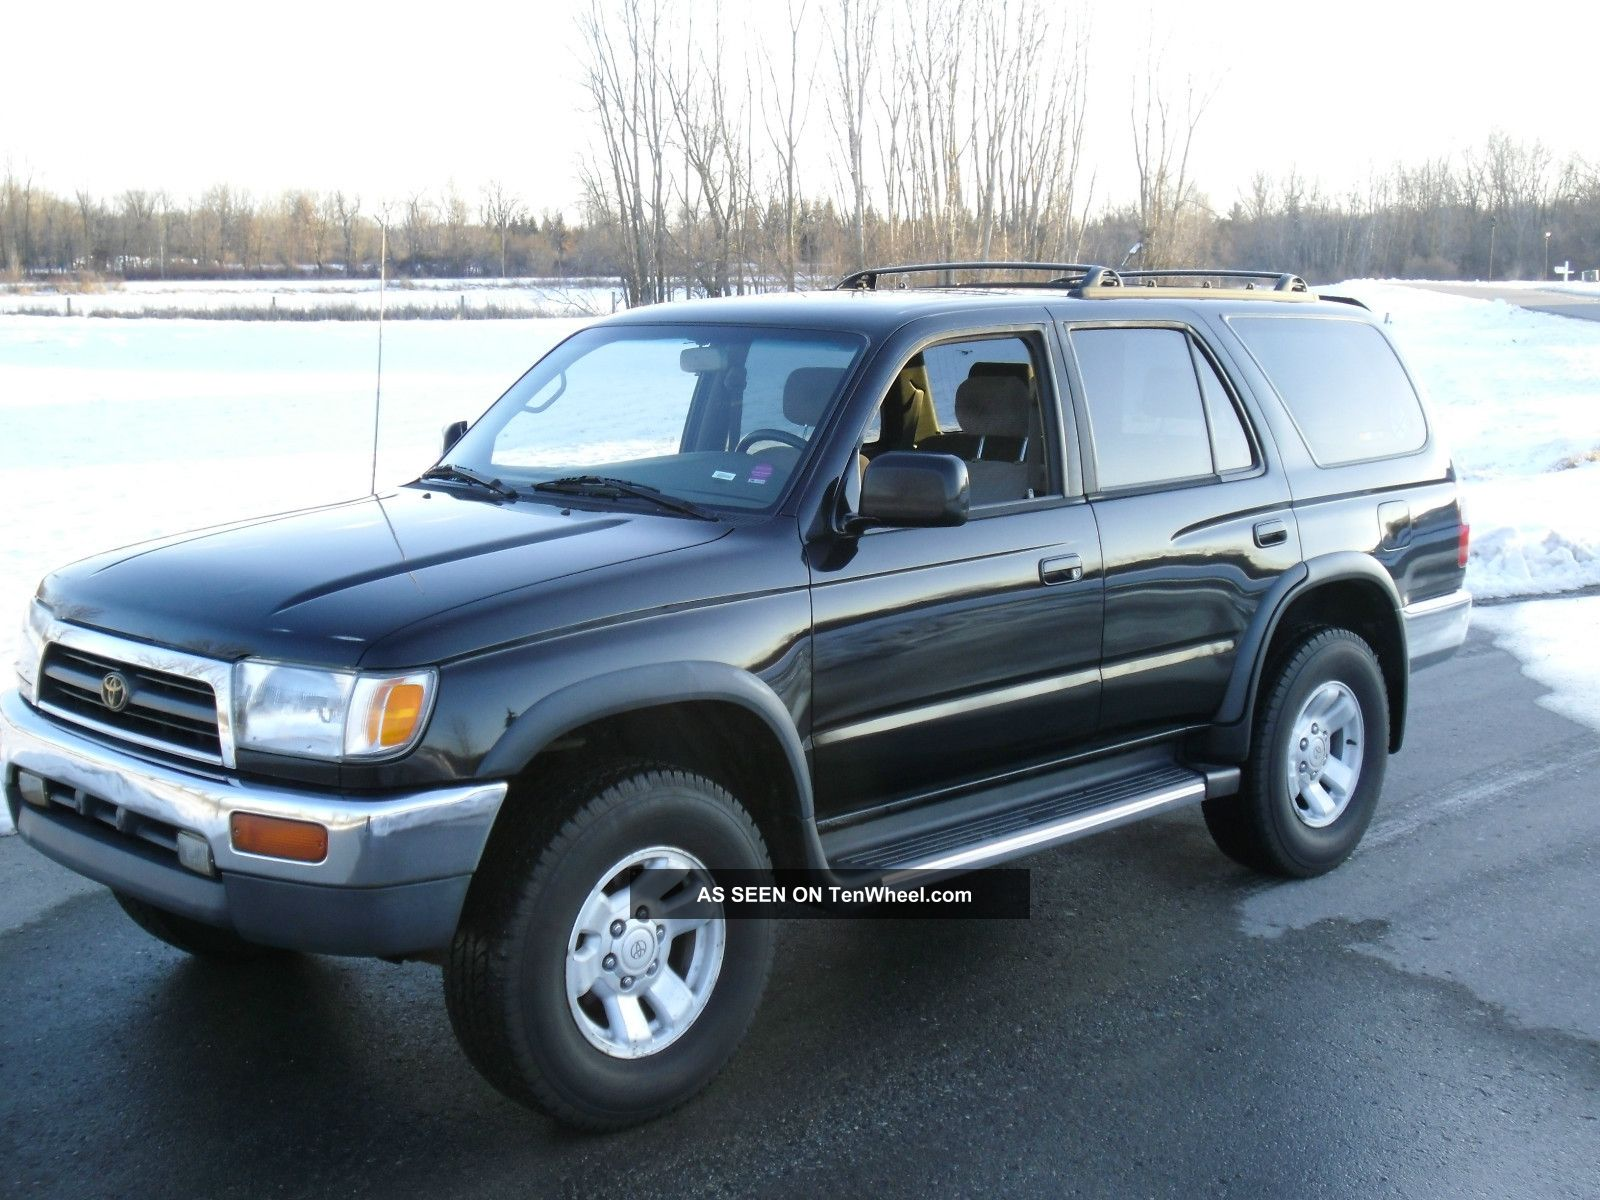 Toyota Tacoma Bull Bars Autoanything Com >> Toyota Land Cruiser Grille Guards Bull Bars Autoanything ...